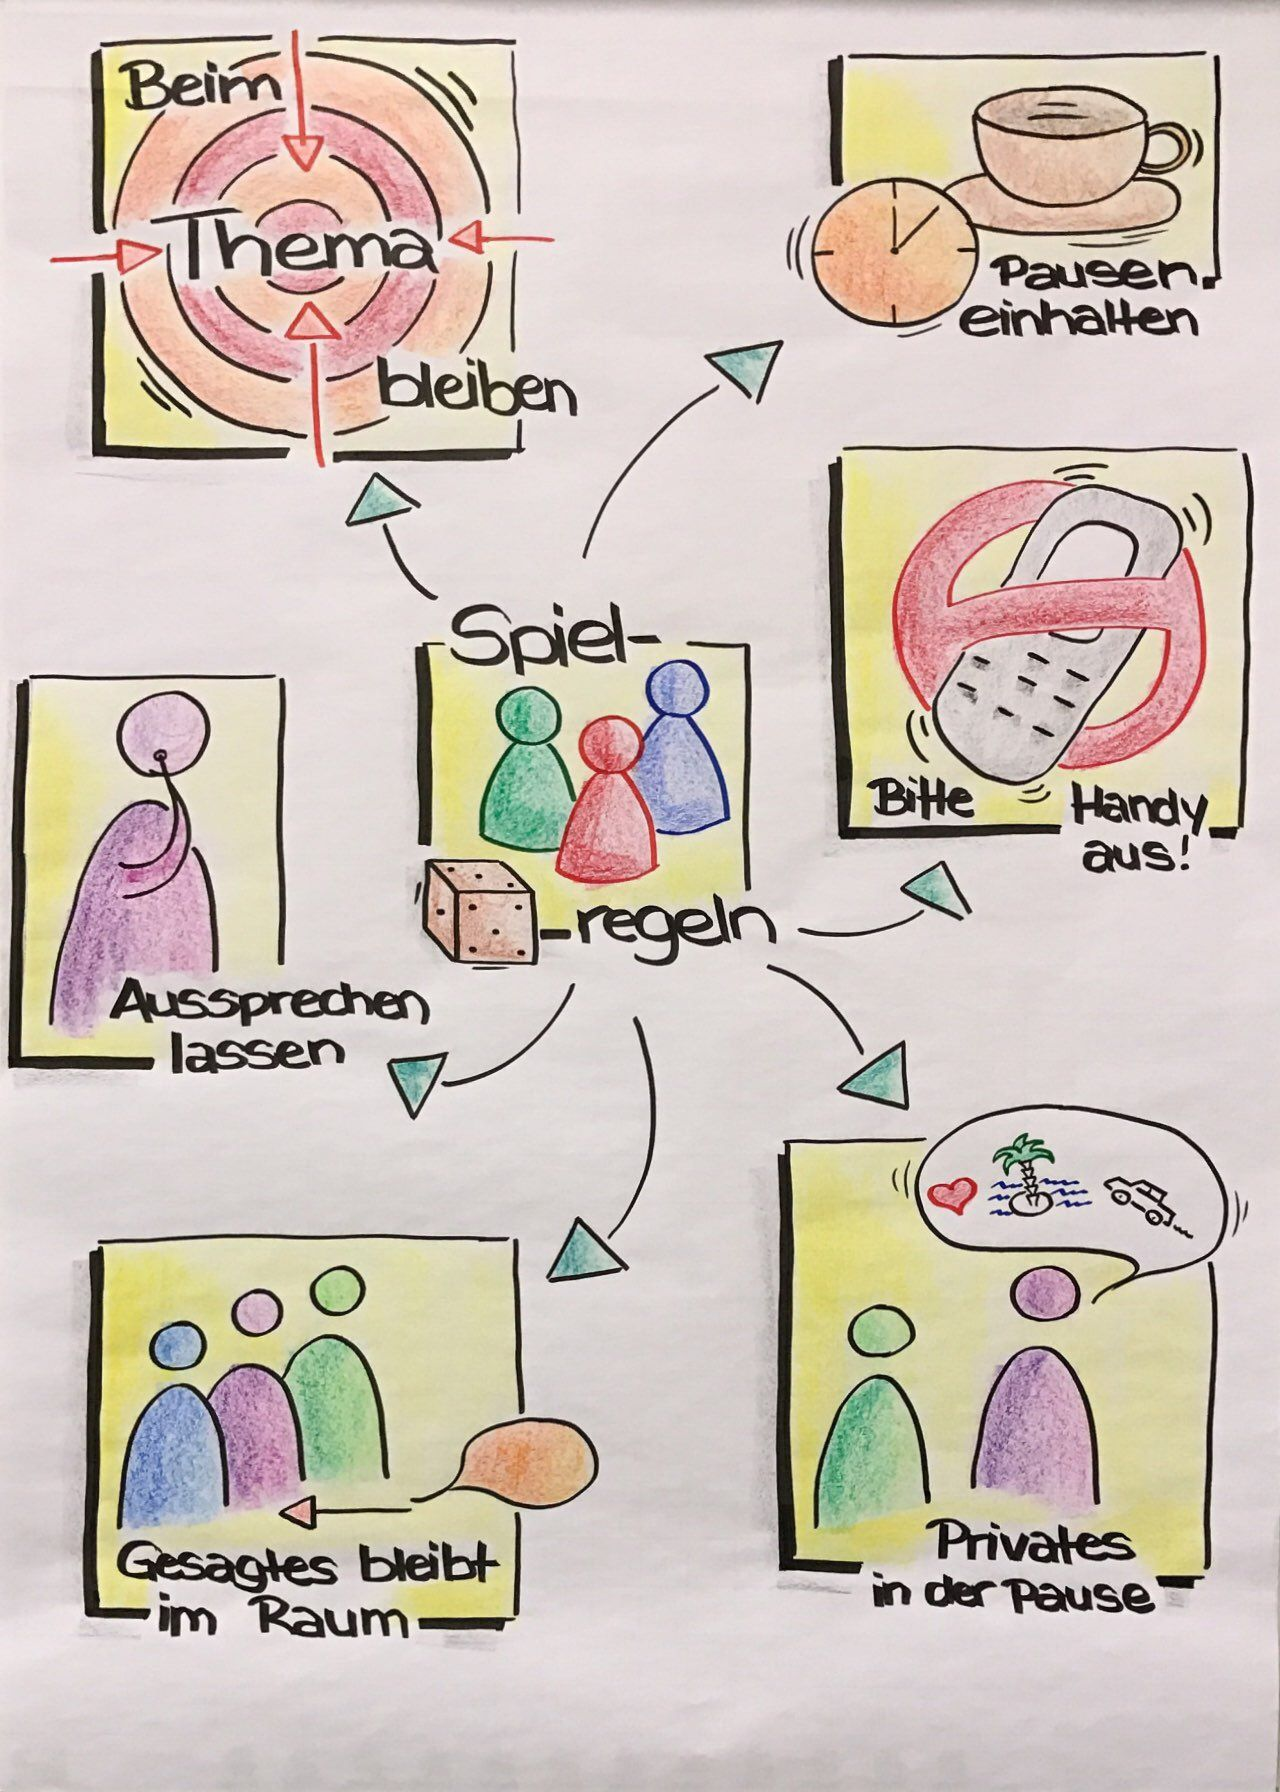 Ideen selbstpräsentation flipchart Darstellung Lebenslauf